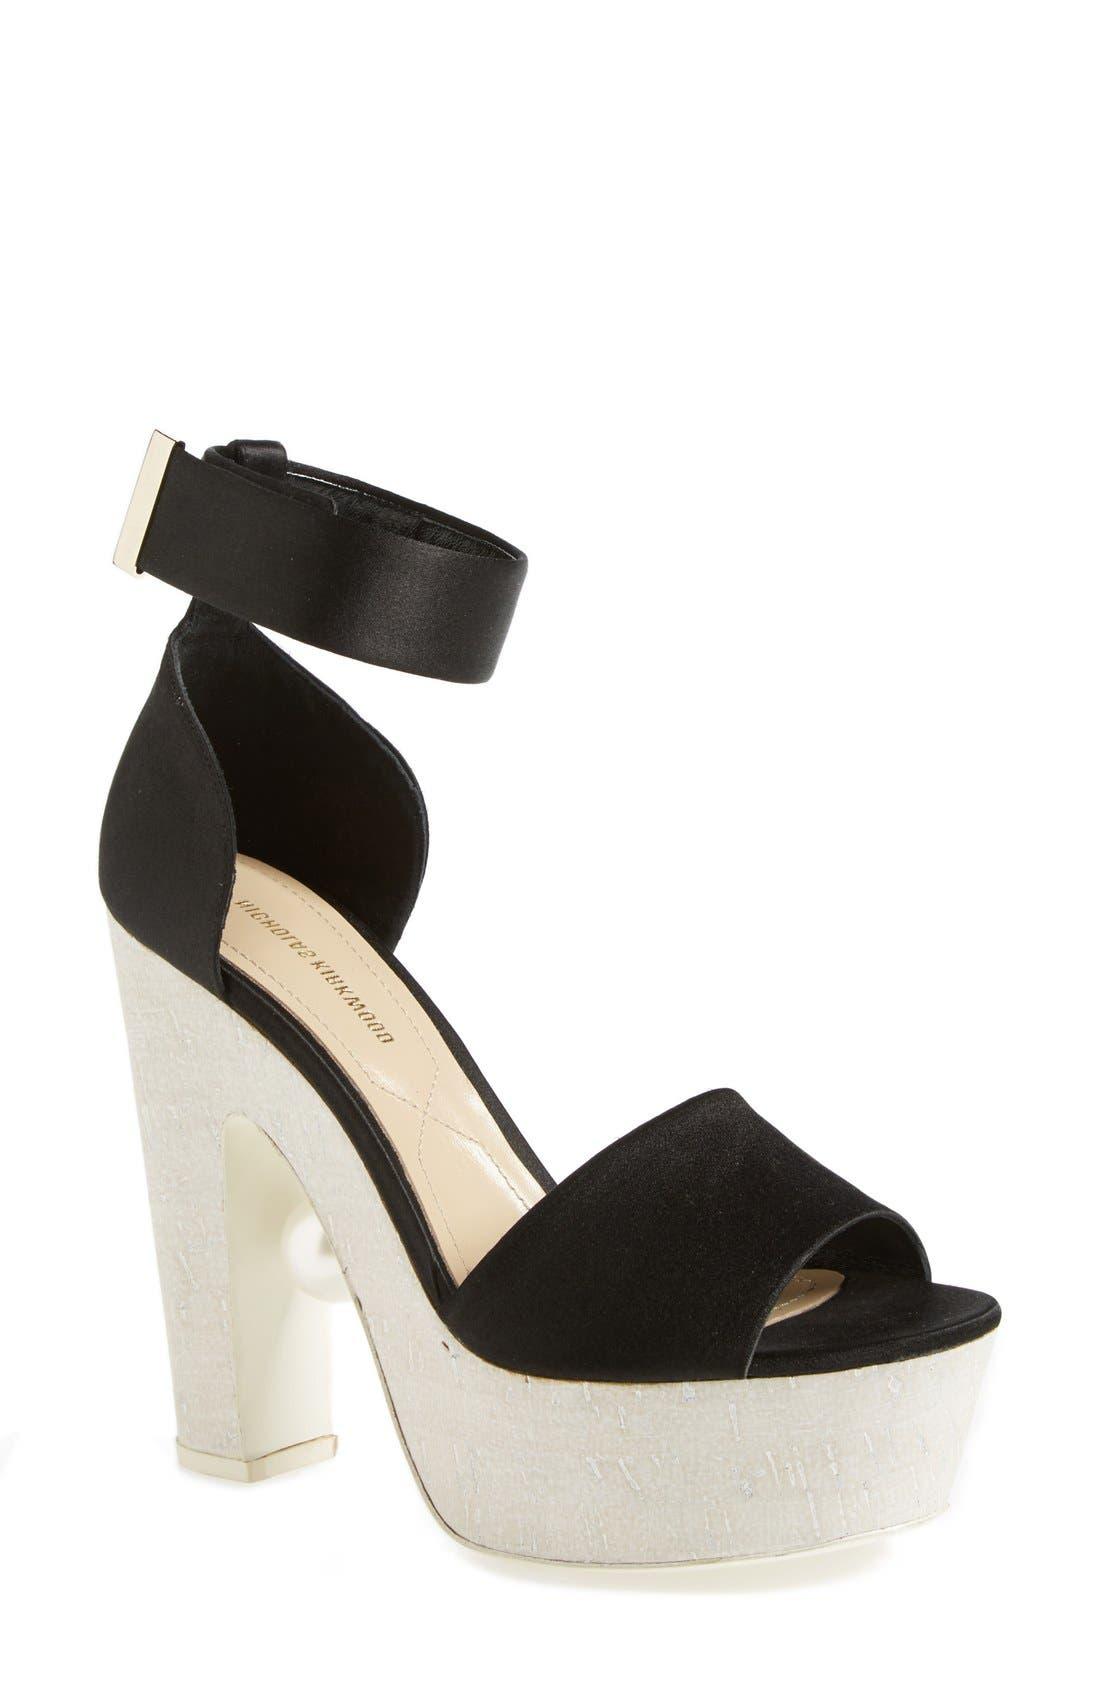 'Pearl' Platform Ankle Strap Sandal,                             Main thumbnail 1, color,                             Black